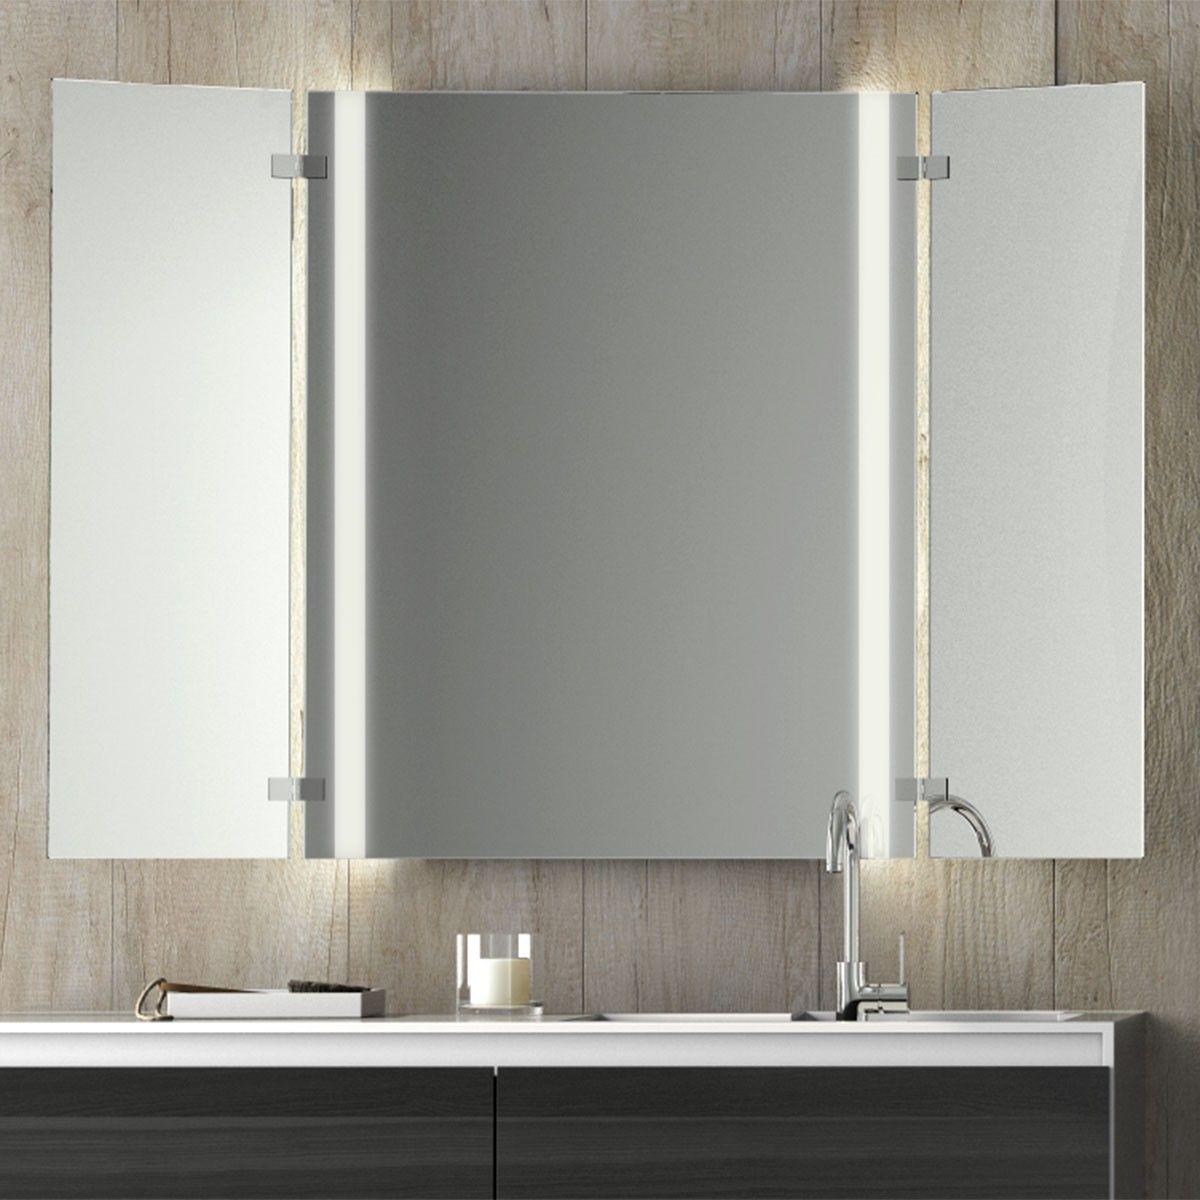 Beleuchteter Klappspiegel Masimo 989702177 In 2020 Klappspiegel Badezimmerspiegel Beleuchten